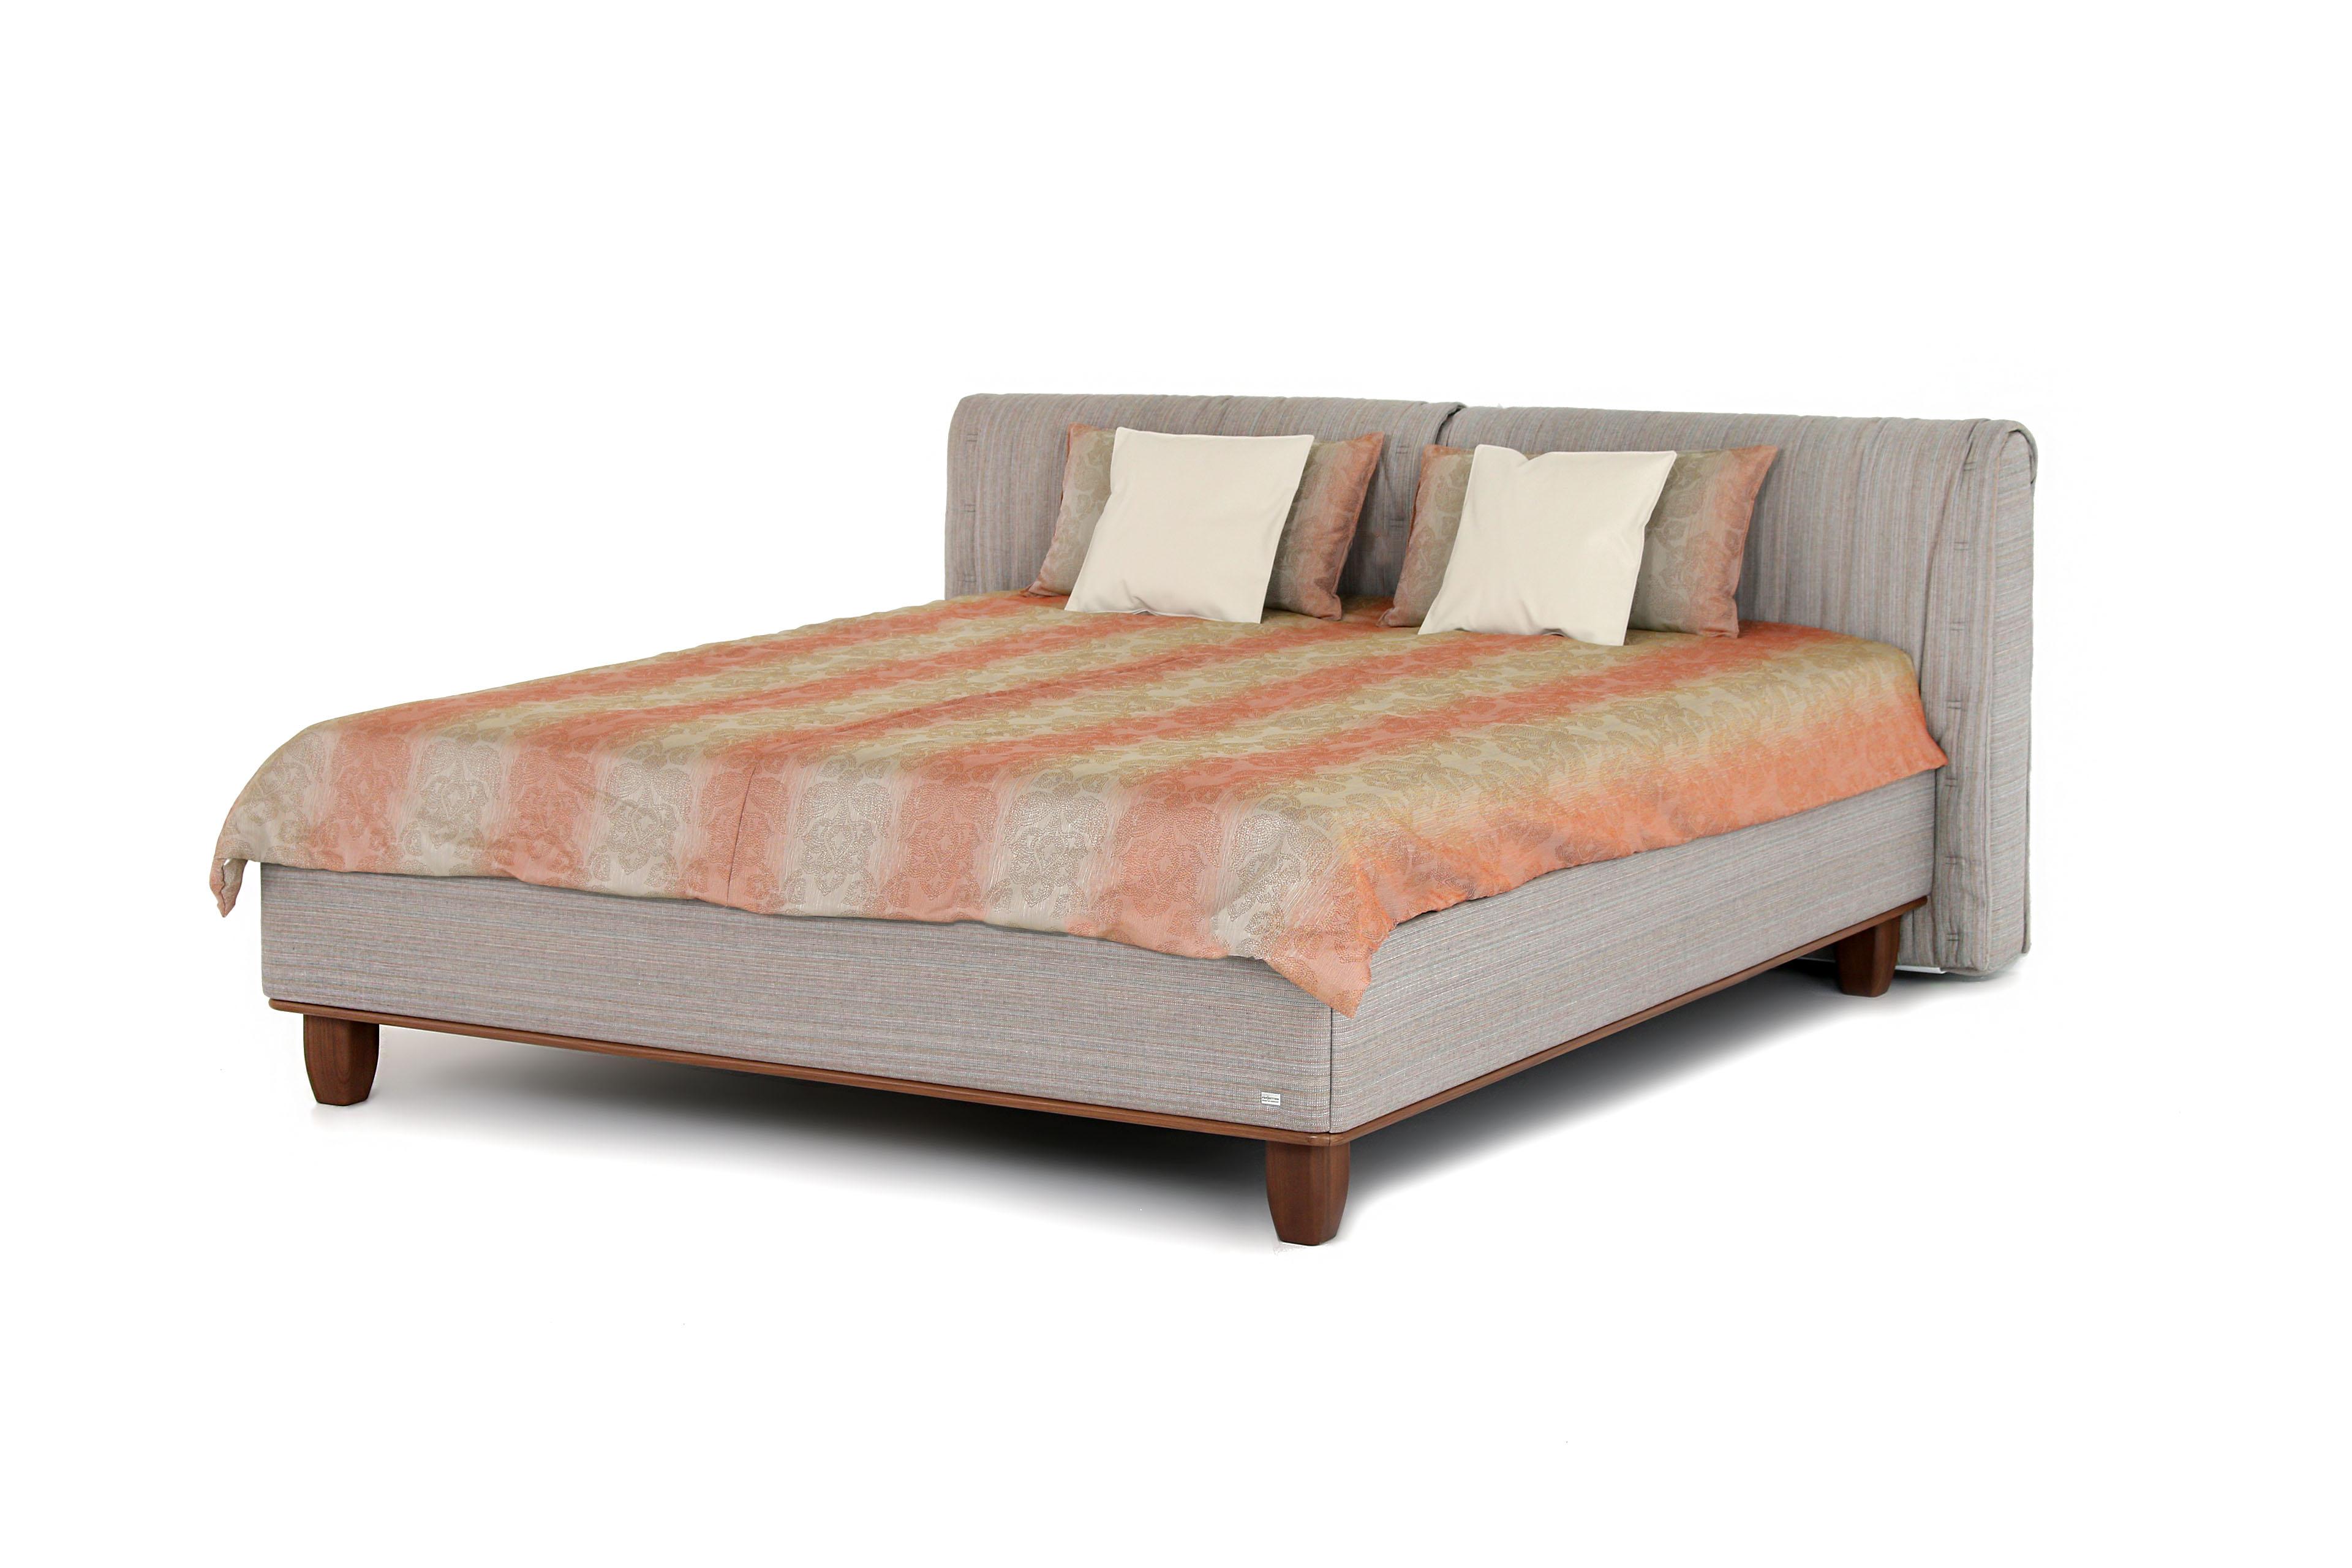 ruf fulari boxspringbett in grau m bel letz ihr online. Black Bedroom Furniture Sets. Home Design Ideas